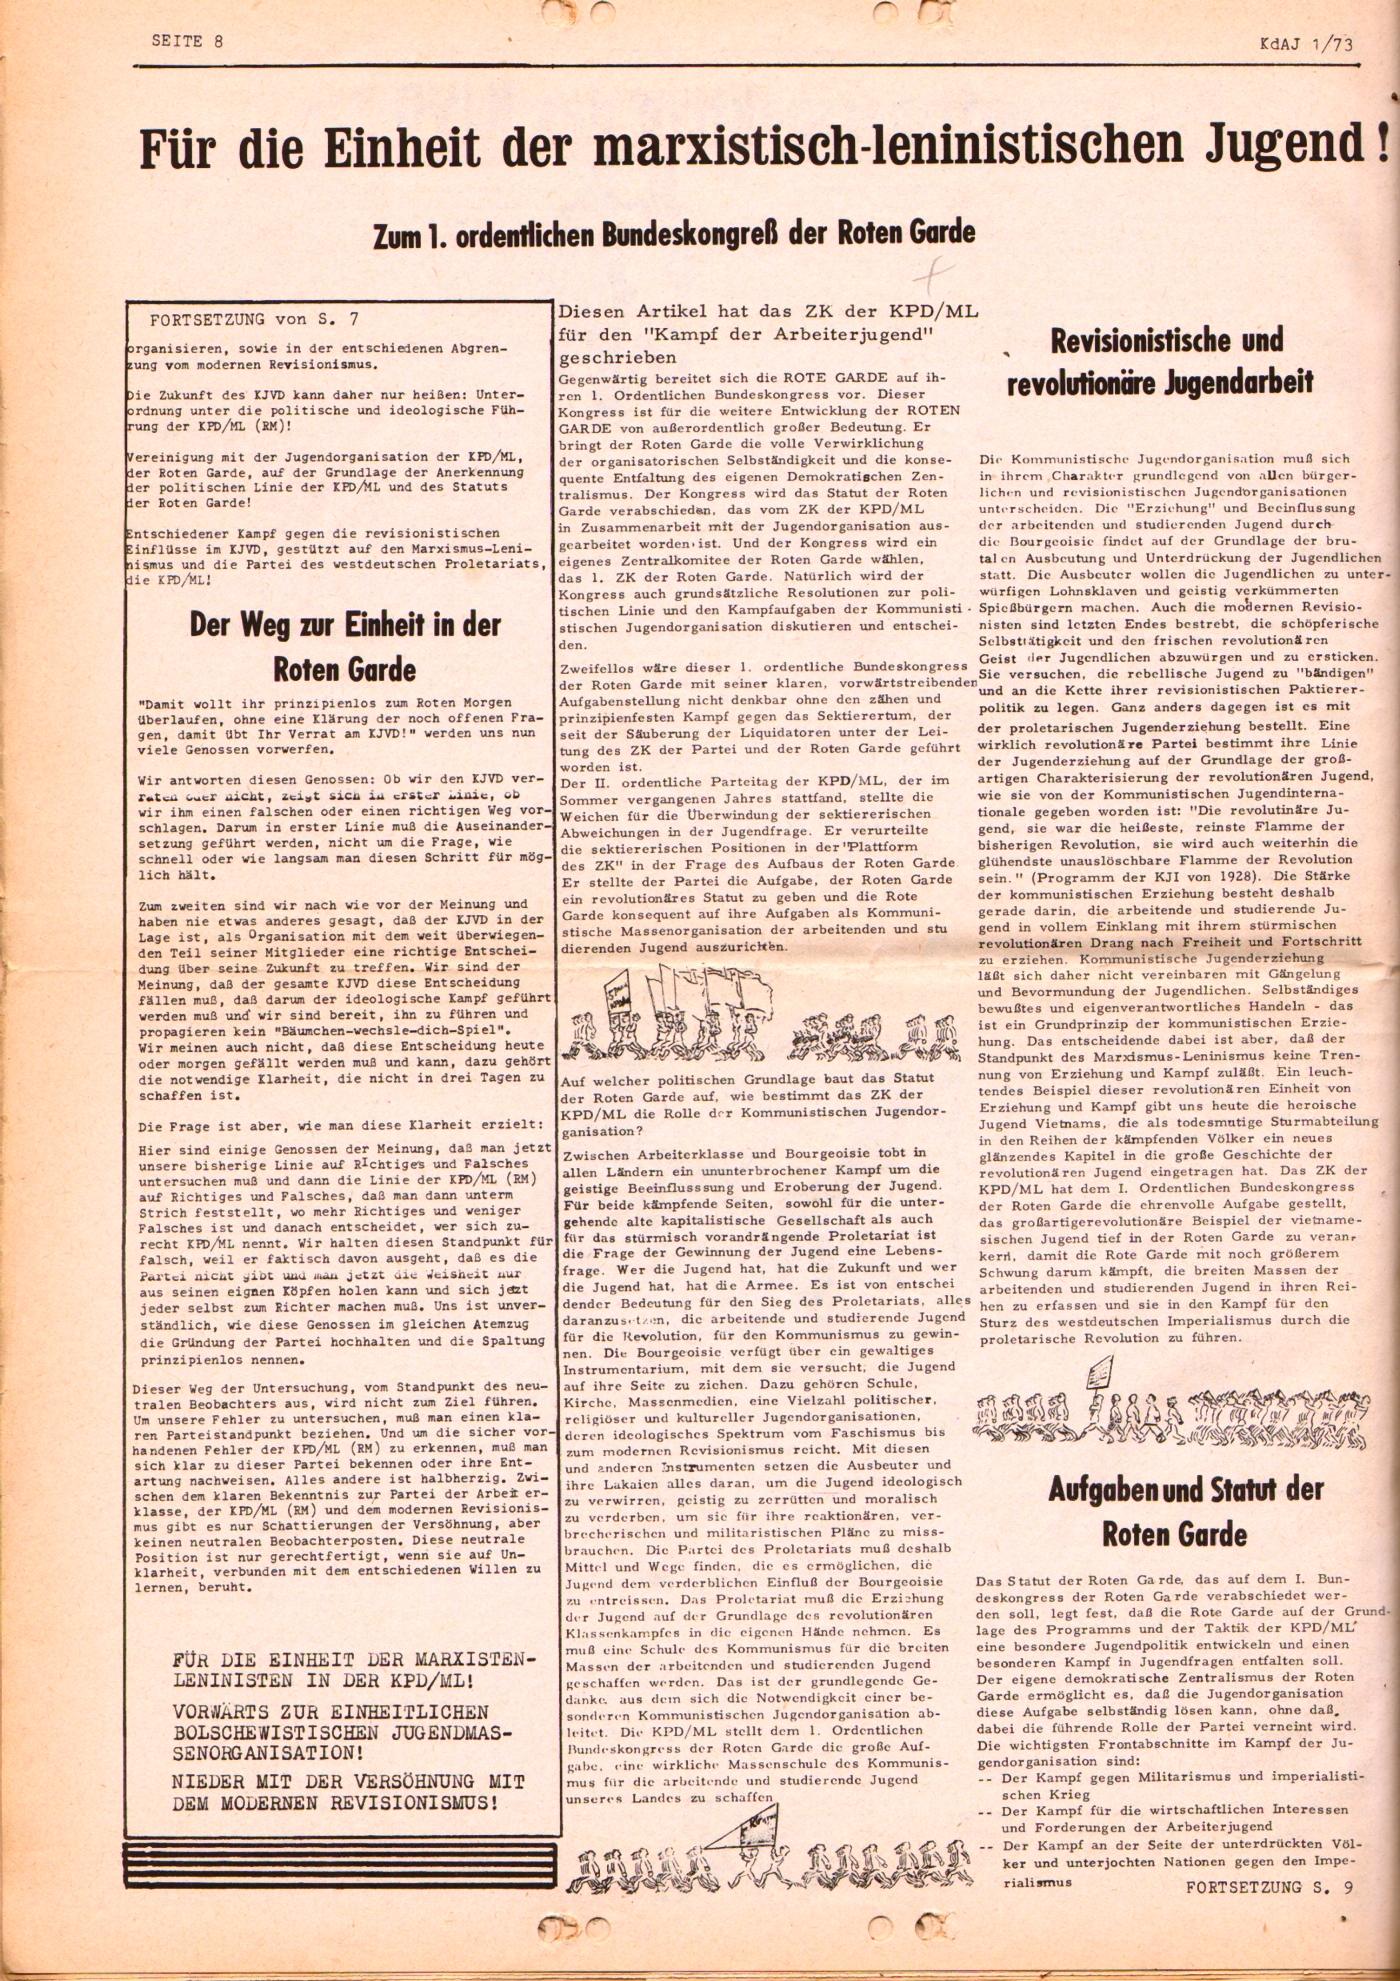 KDAJ, 4. Jg., März 1973, Nr. 1, Seite 8